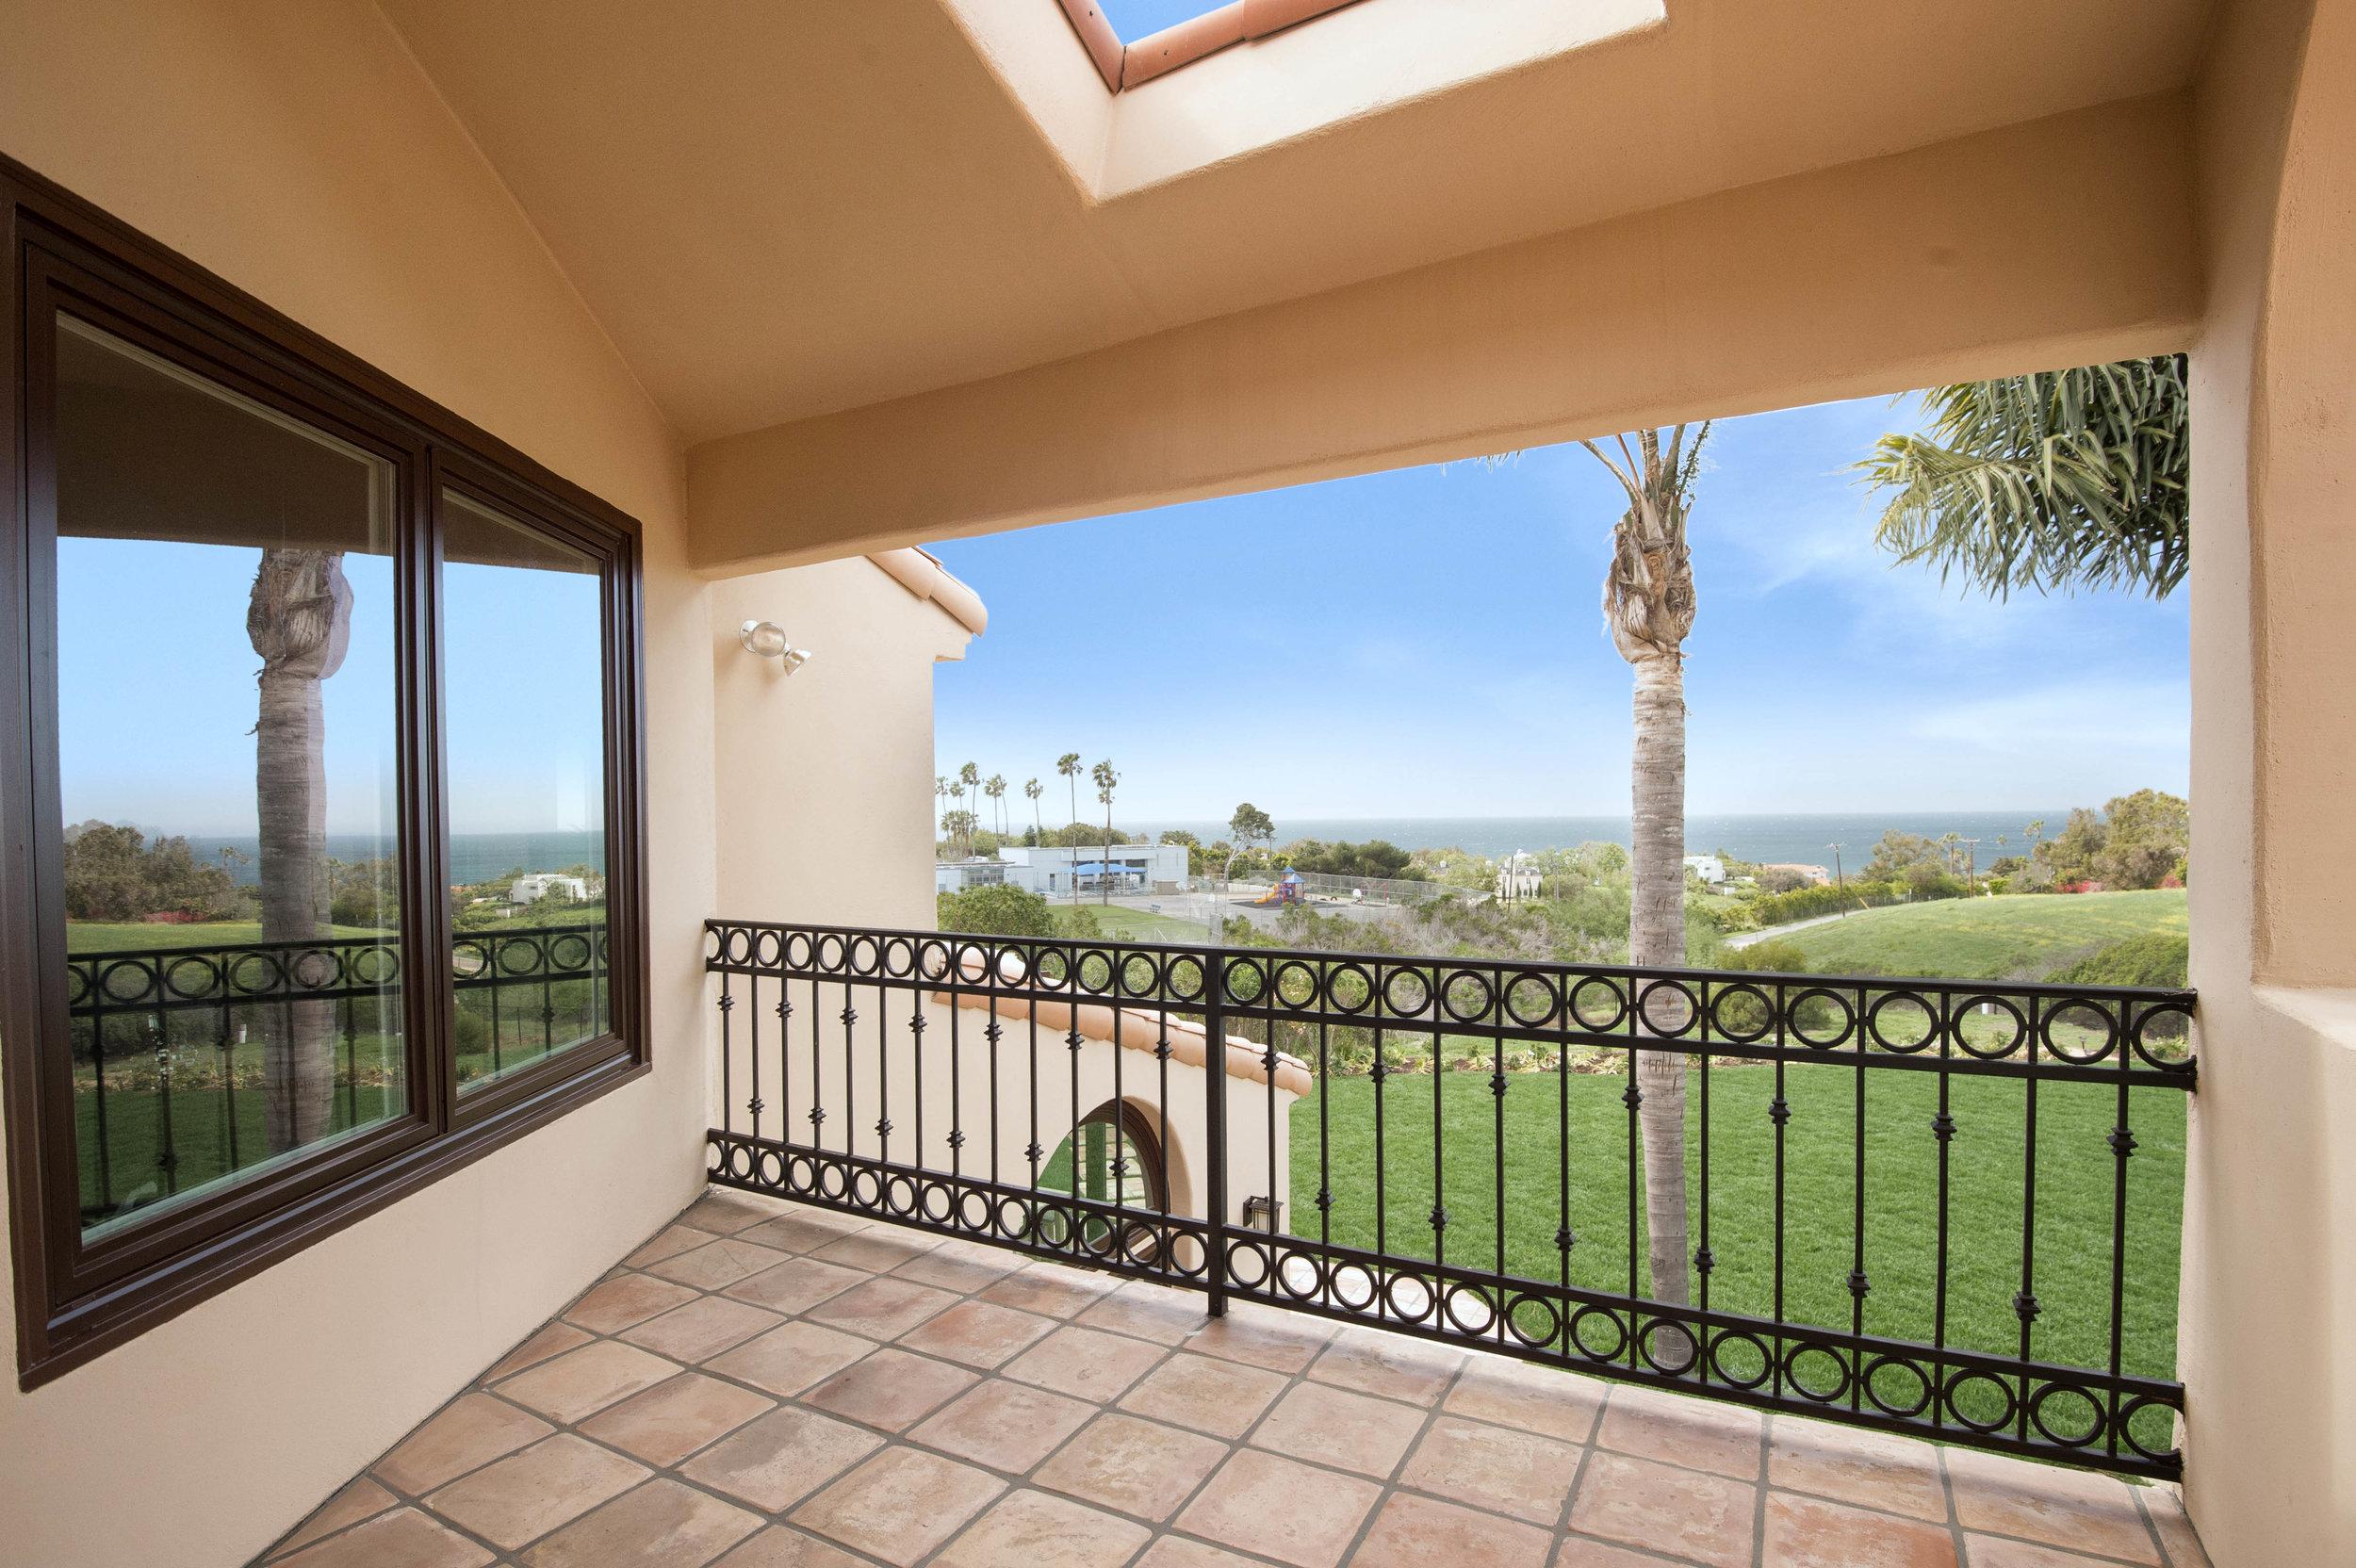 013 Deck 6130 Via Cabrillo For Sale Lease The Malibu Life Team Luxury Real Estate.jpg